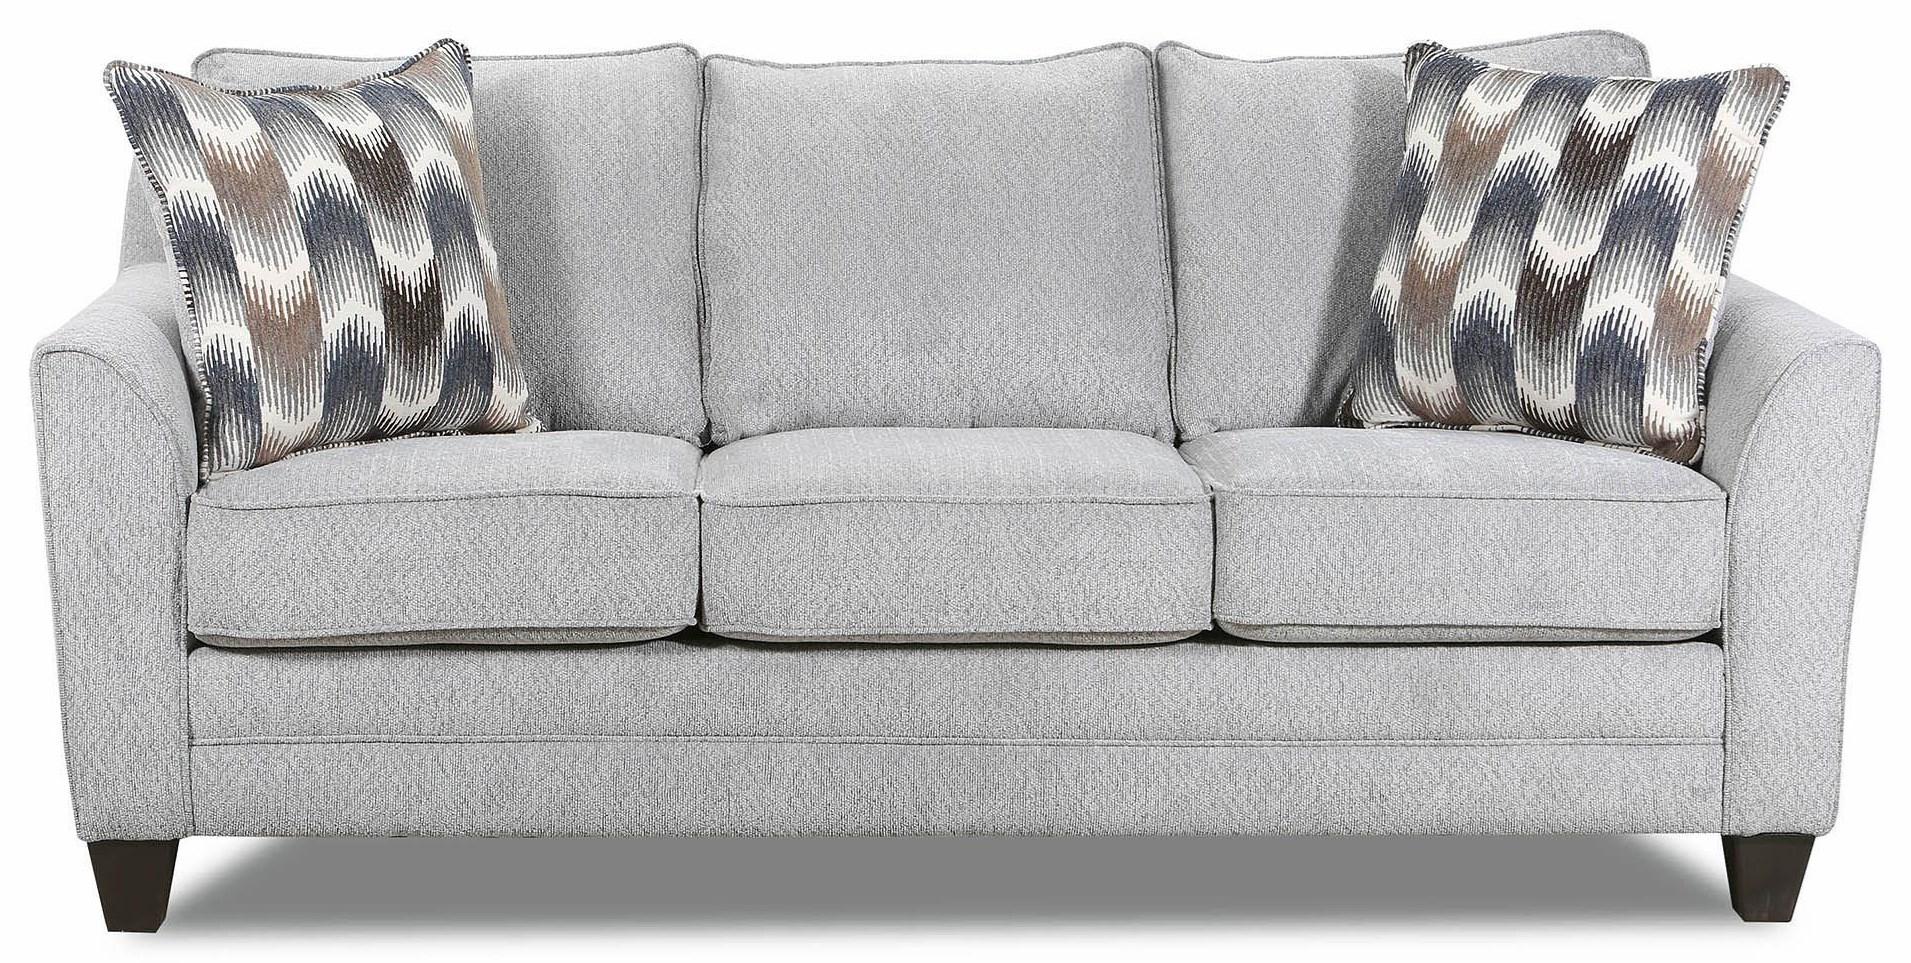 2013 Sleeper Sofa by Lane at Furniture Fair - North Carolina